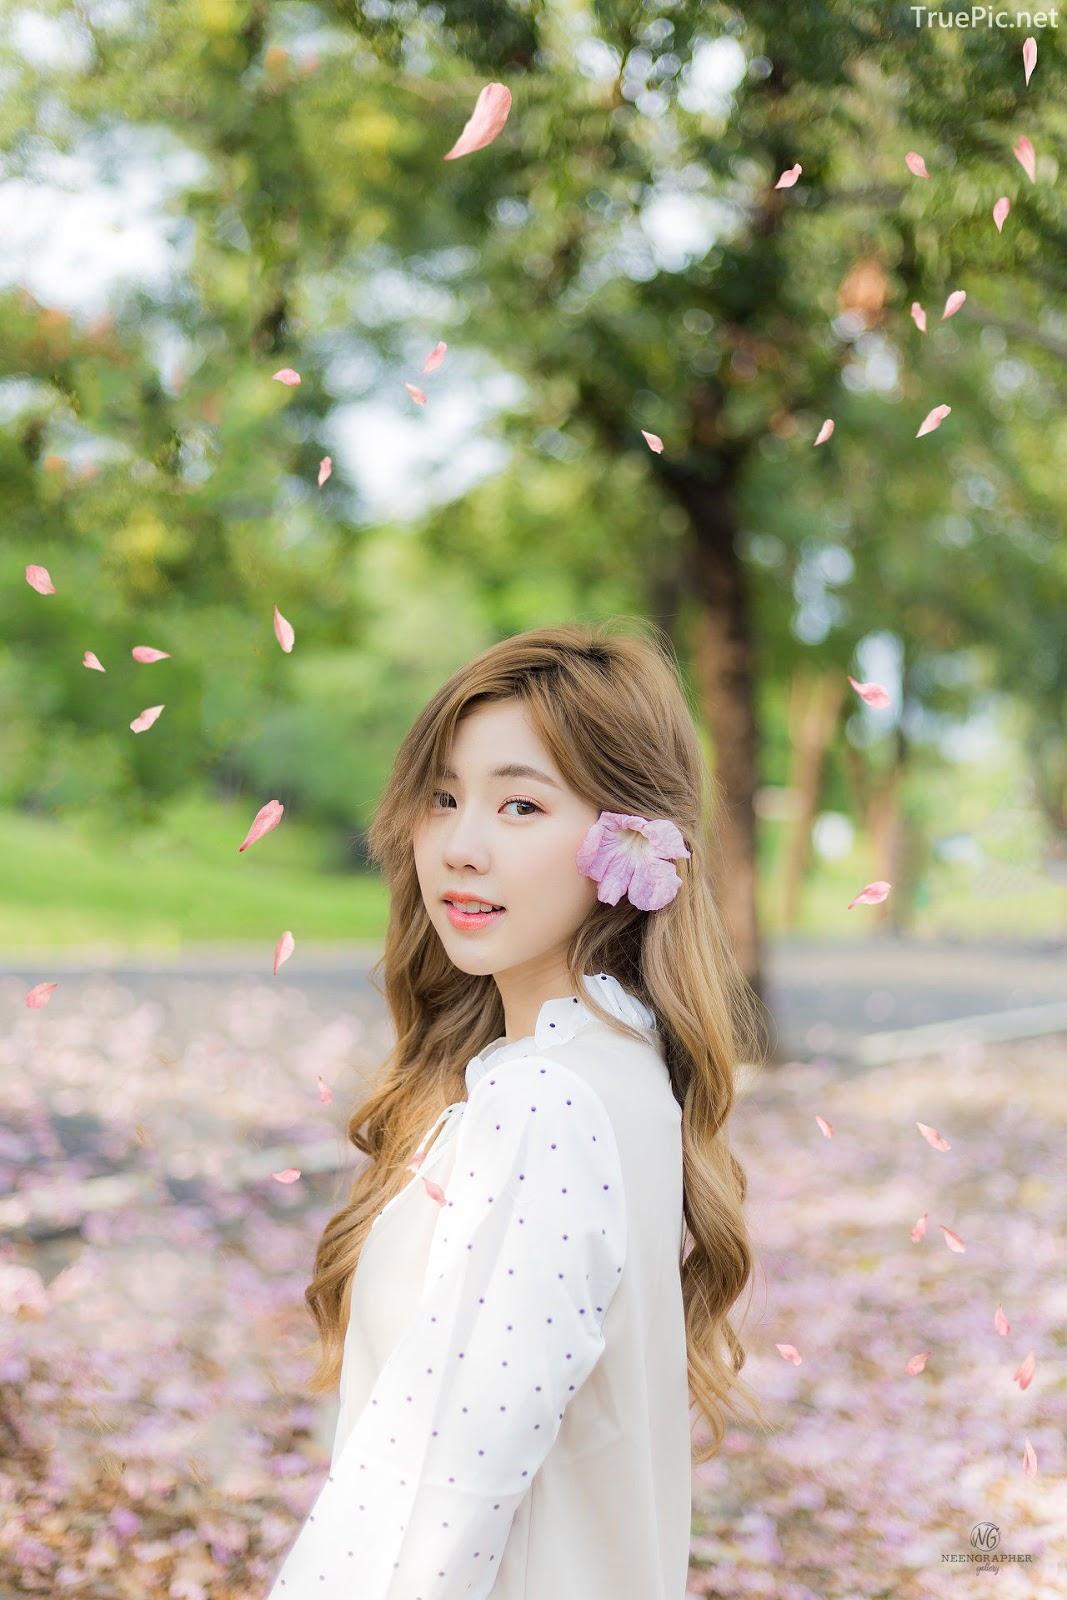 Thailand cute model Nilawan Iamchuasawad - Beautiful girl in the flower field - Photo by จิตรทิวัส จั่นระยับ - Picture 7